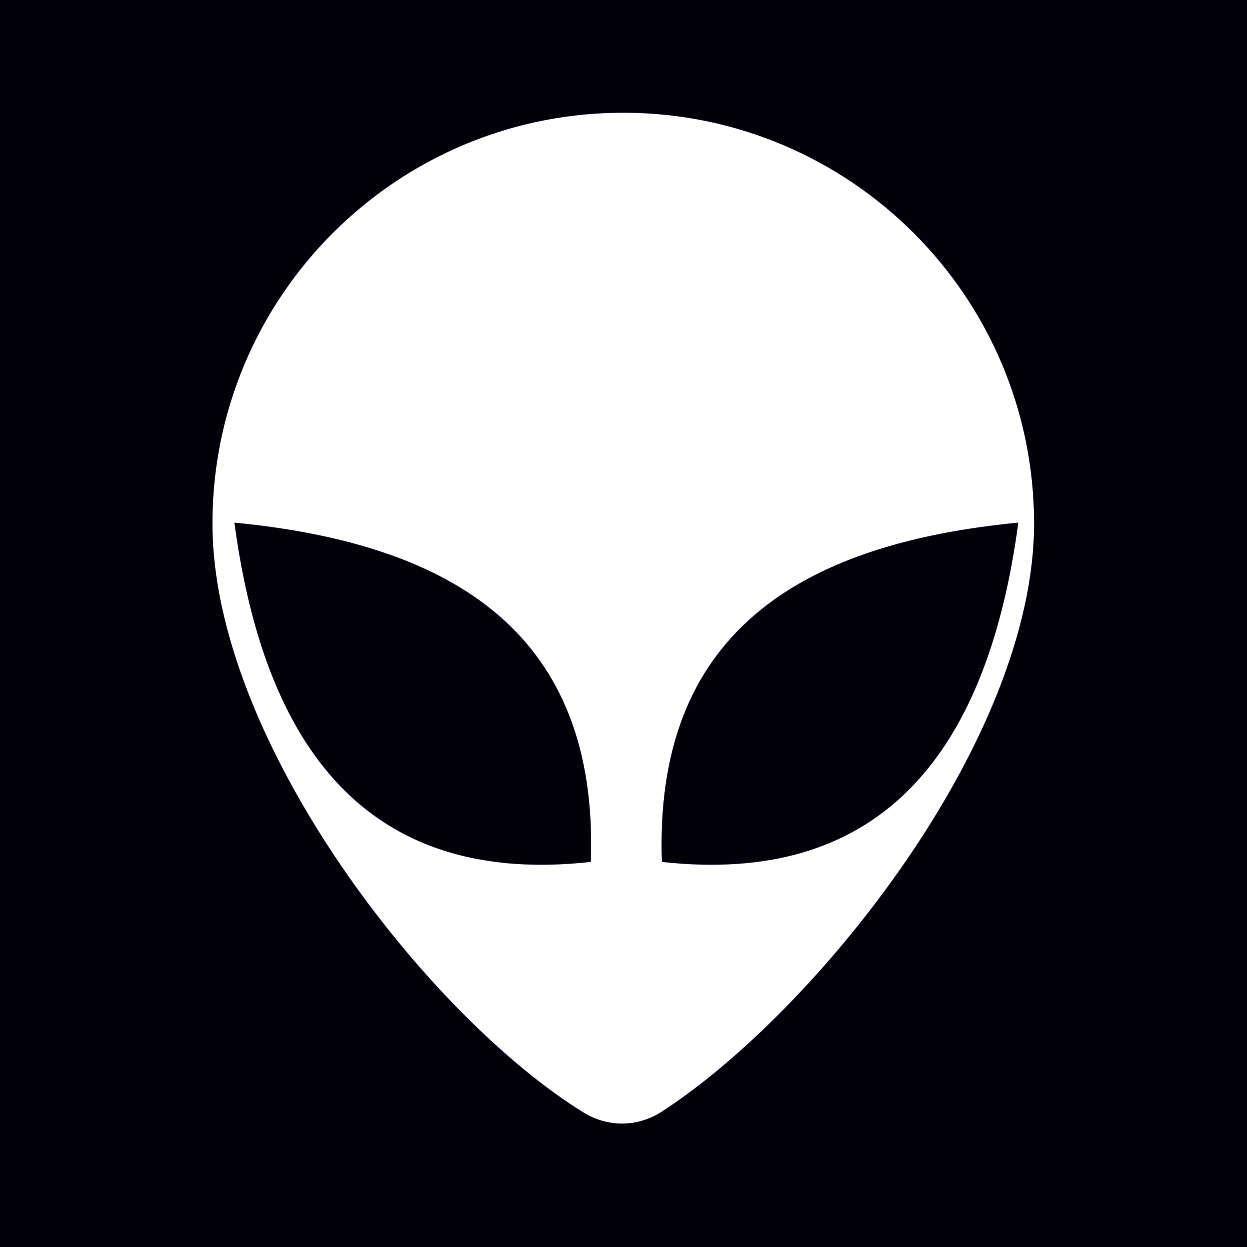 Alien Grey Head Stencil